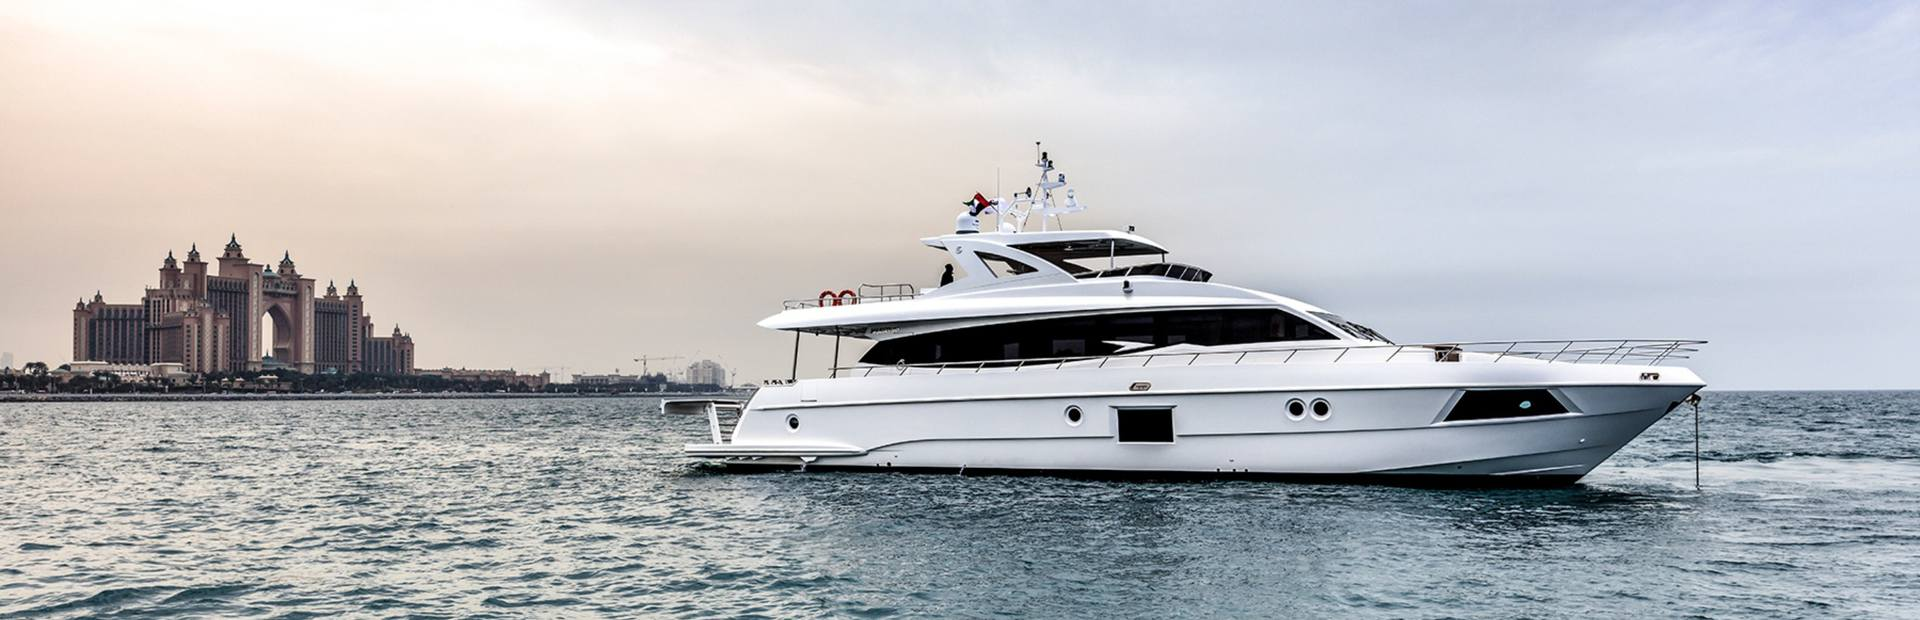 Majesty 90 Yacht Charter